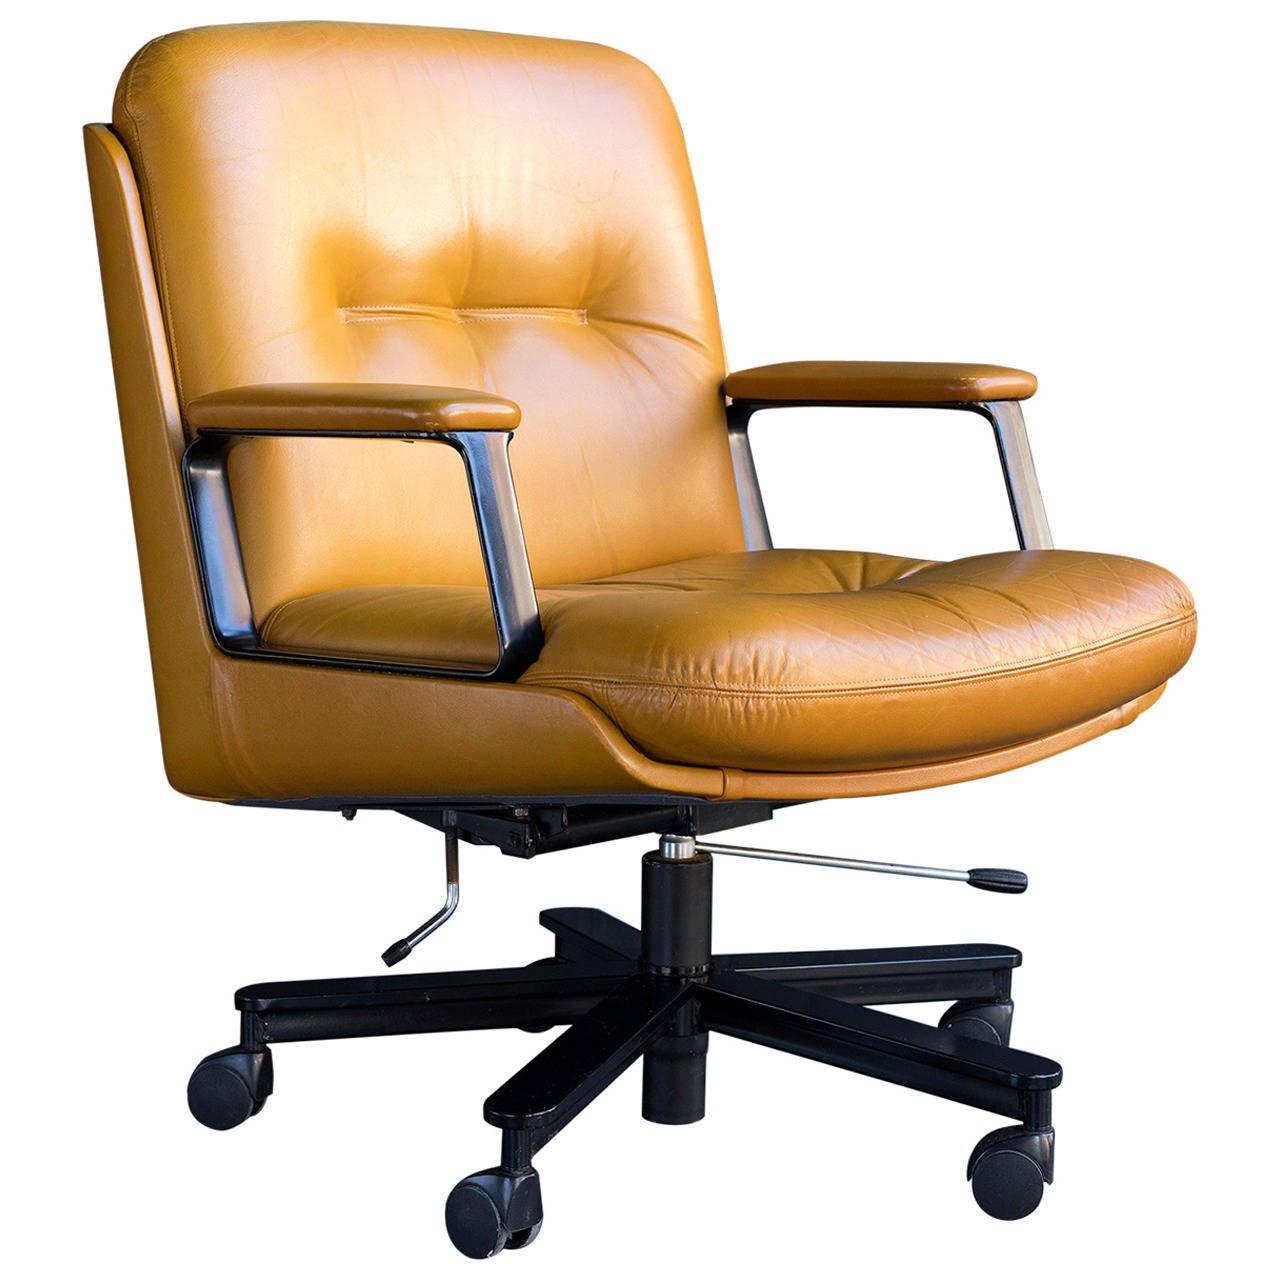 desk chair utm target parsons scandinavian modern office at 1stdibs